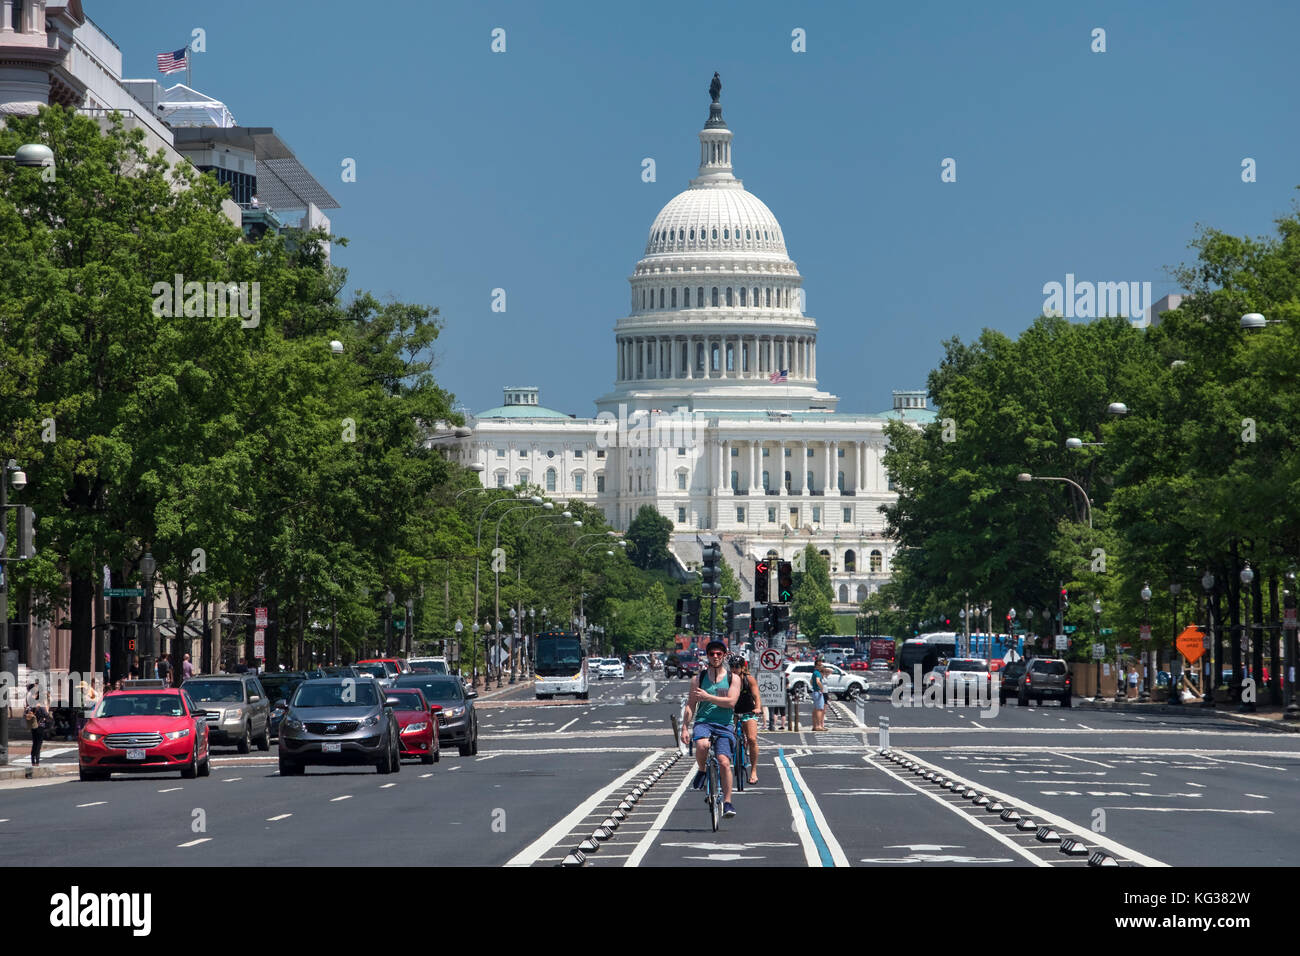 United States Capitol Building und der Pennsylvania Avenue, Washington DC, USA Stockbild